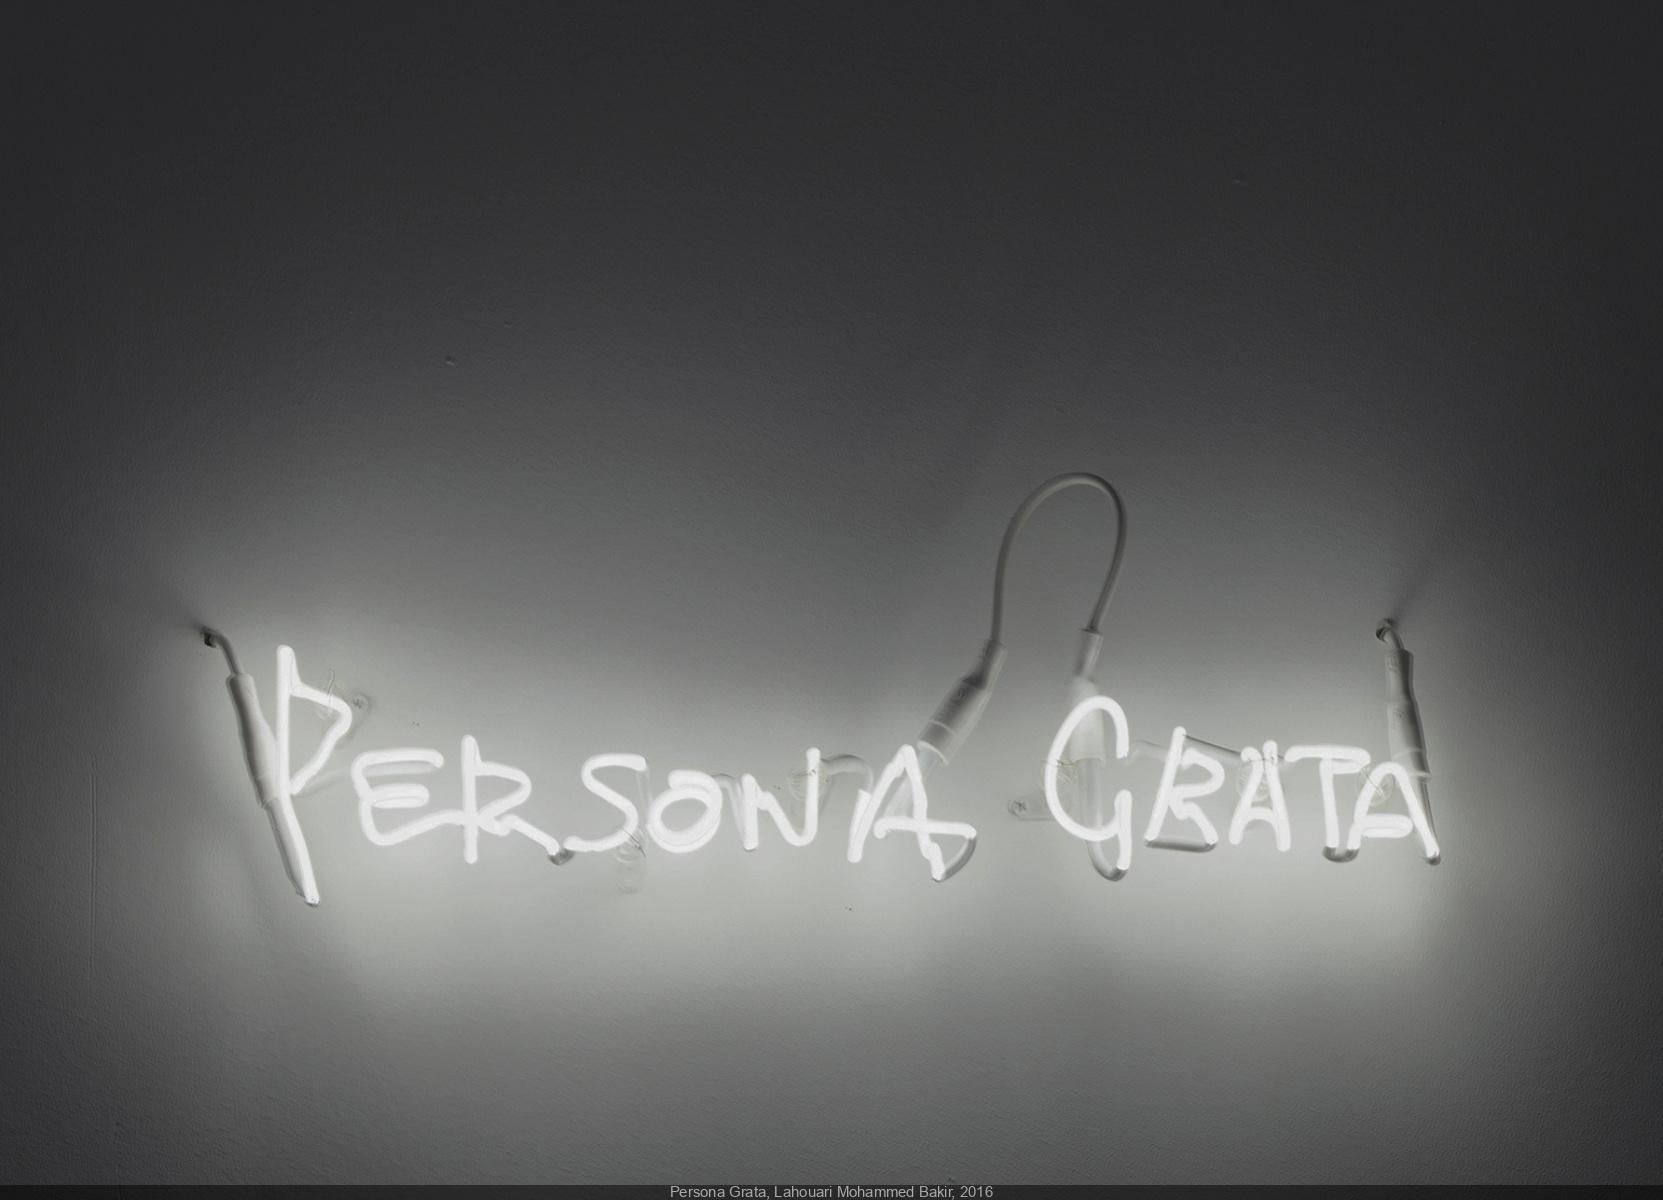 Persona Grata, the compelling exhibition at Paris Musée de l